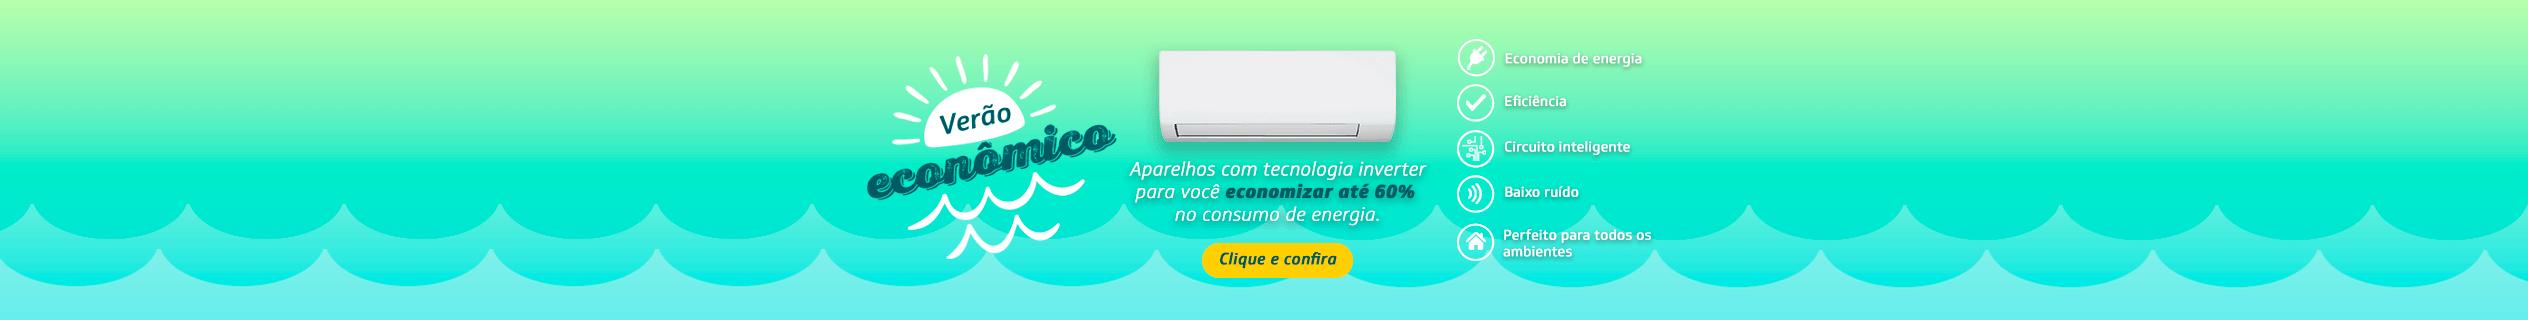 full_banner-desktop-verao-economico-1401-2701-1